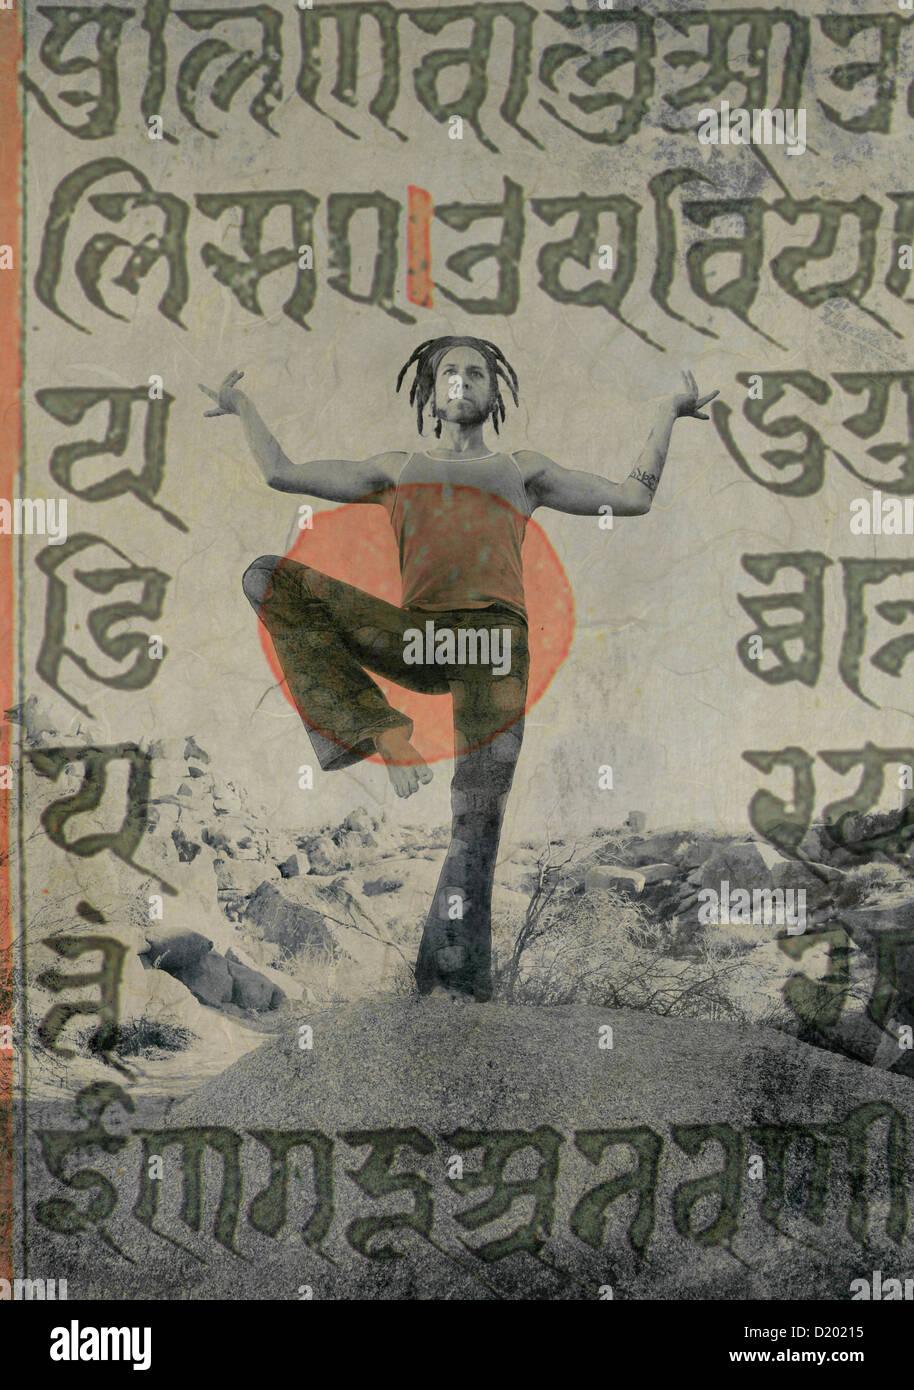 Yogi Shiva dancer avec les anciens écrits sacrés sanskrit superposées. Photo Stock